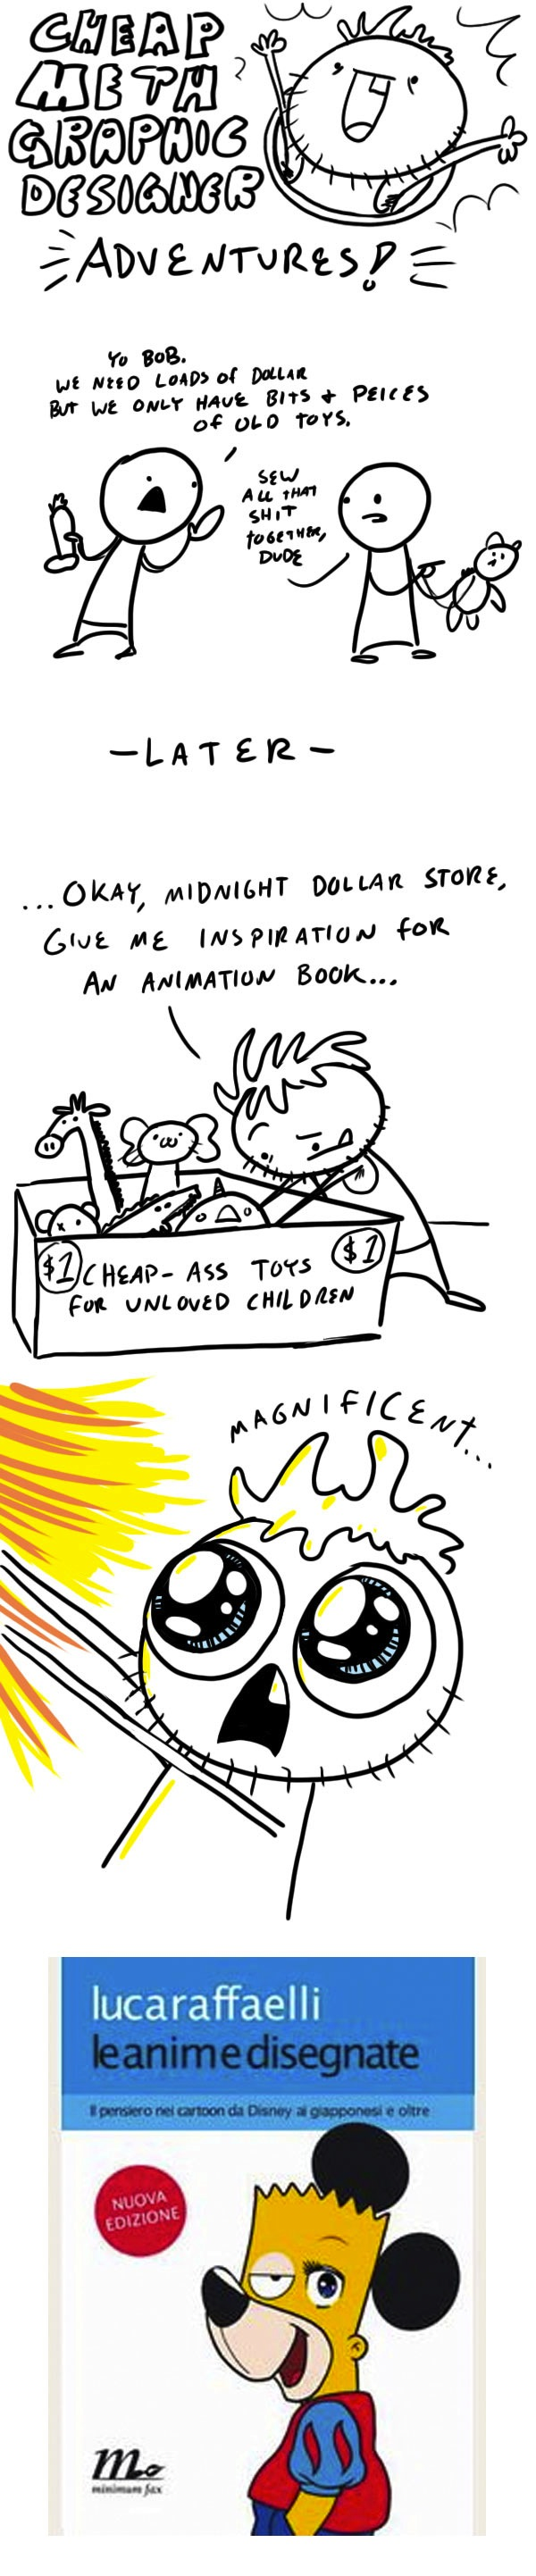 Animation Manual